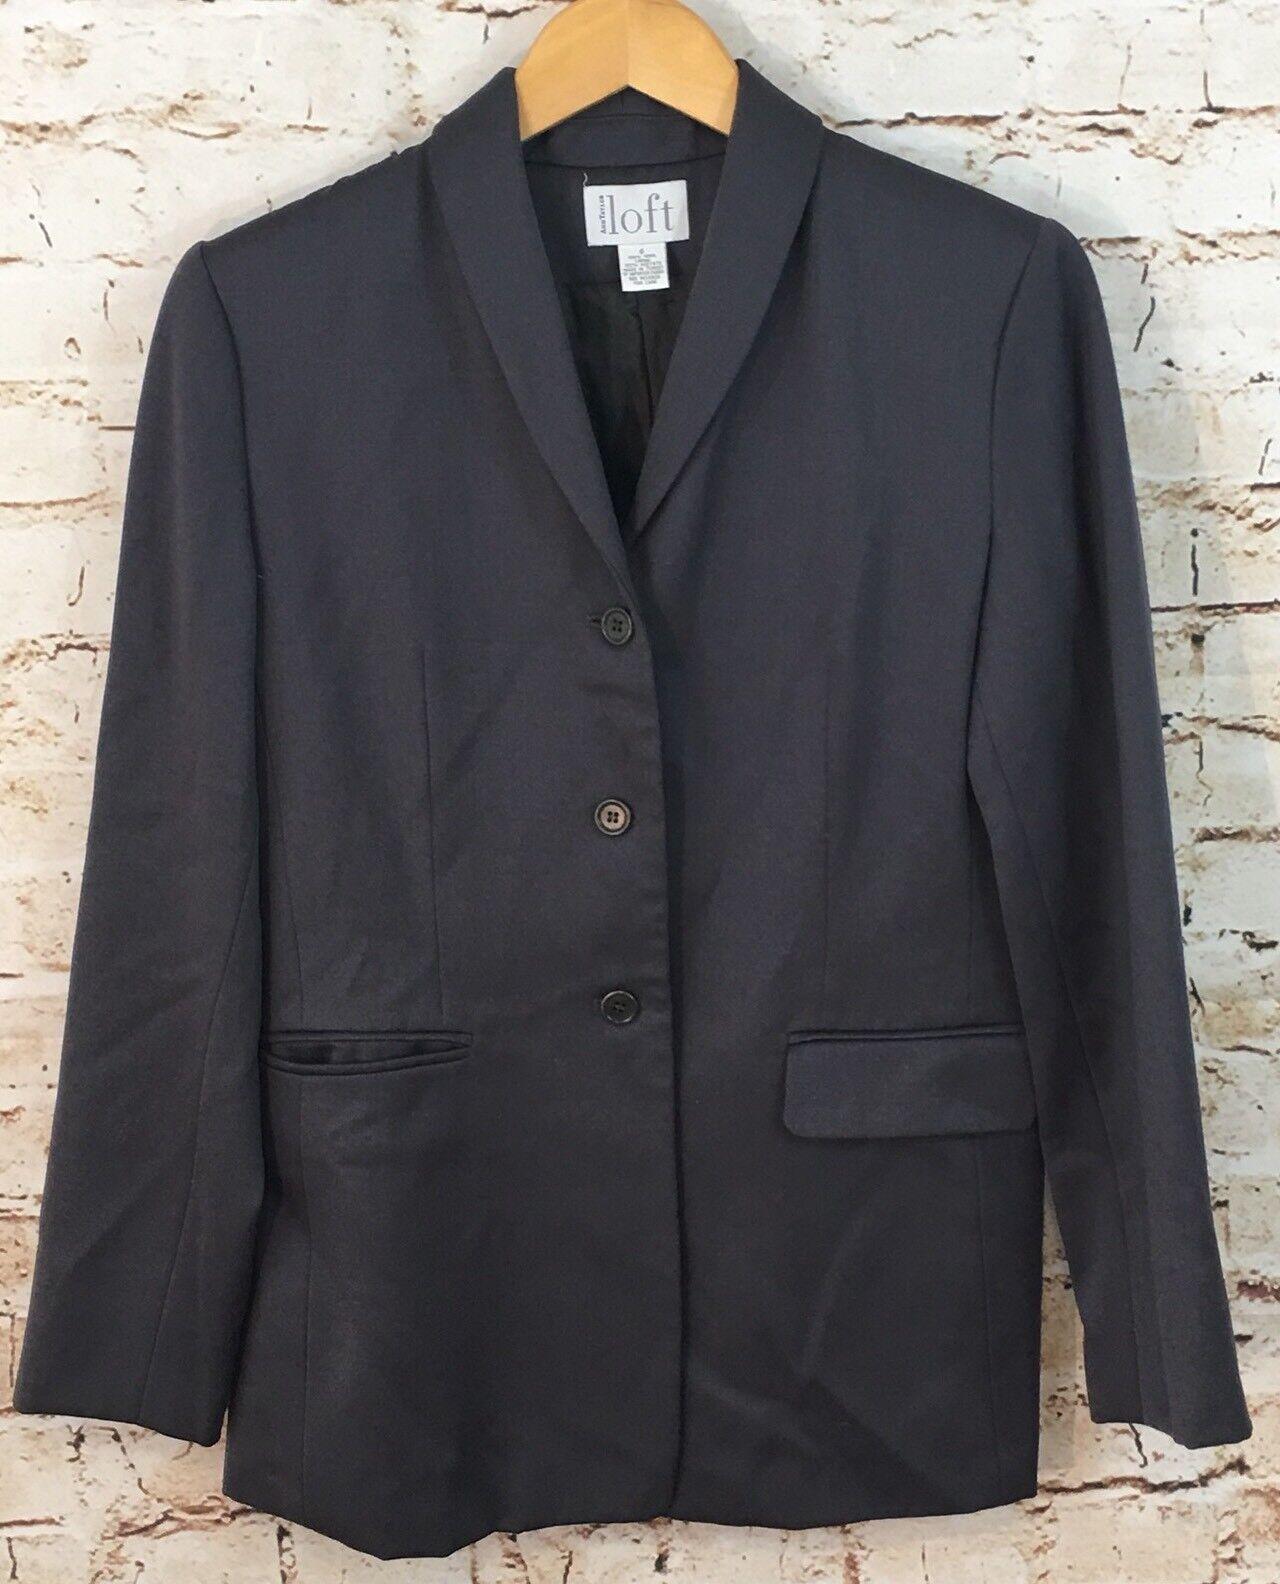 Ann Taylor LOFT blazer womens 6 gray 100% wool 3 button suit jacket B1